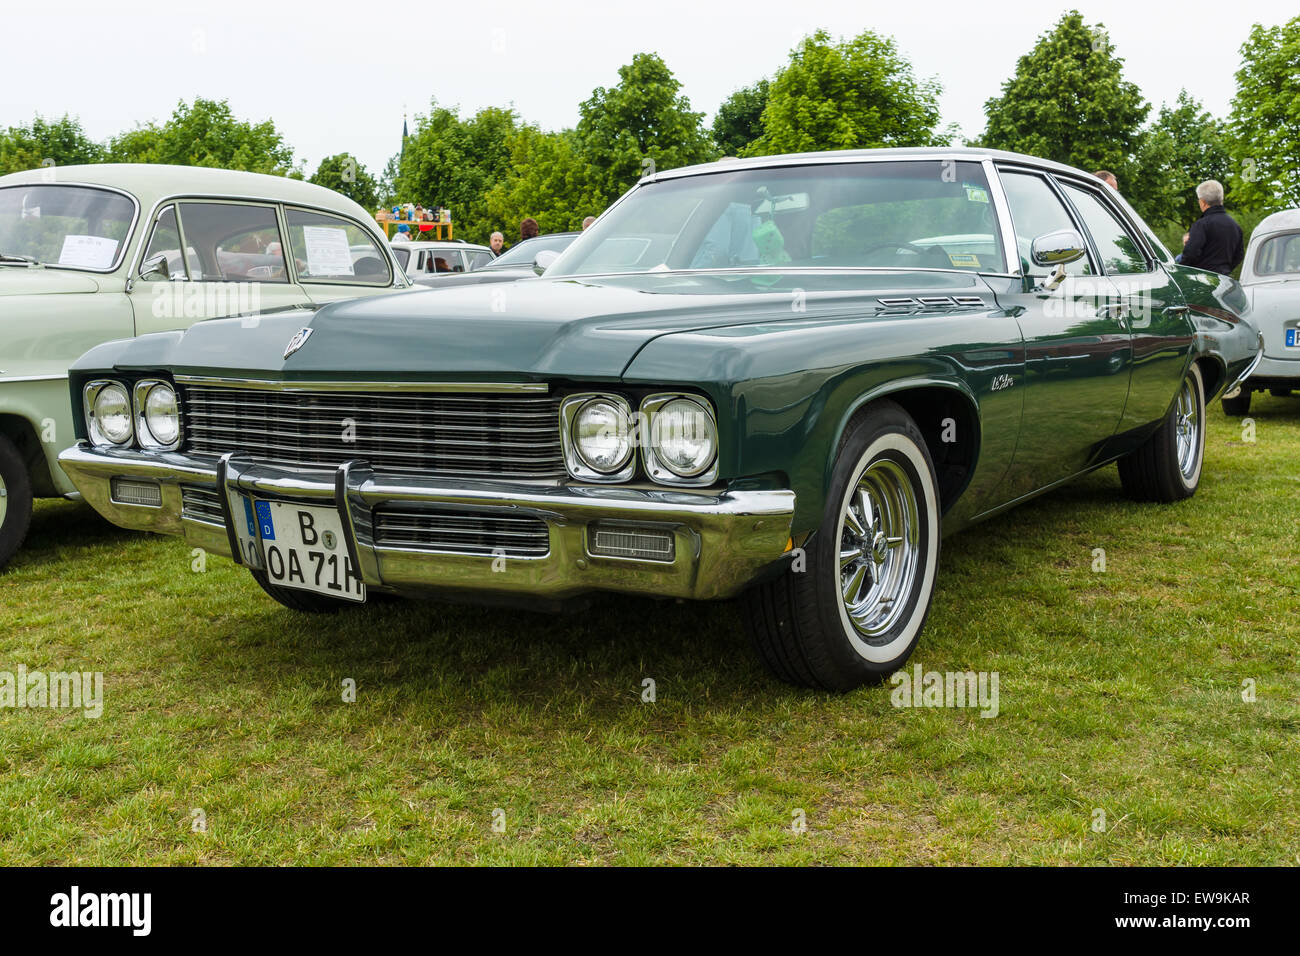 full size luxury car buick lesabre sedan fourth generation 1971 rh alamy com